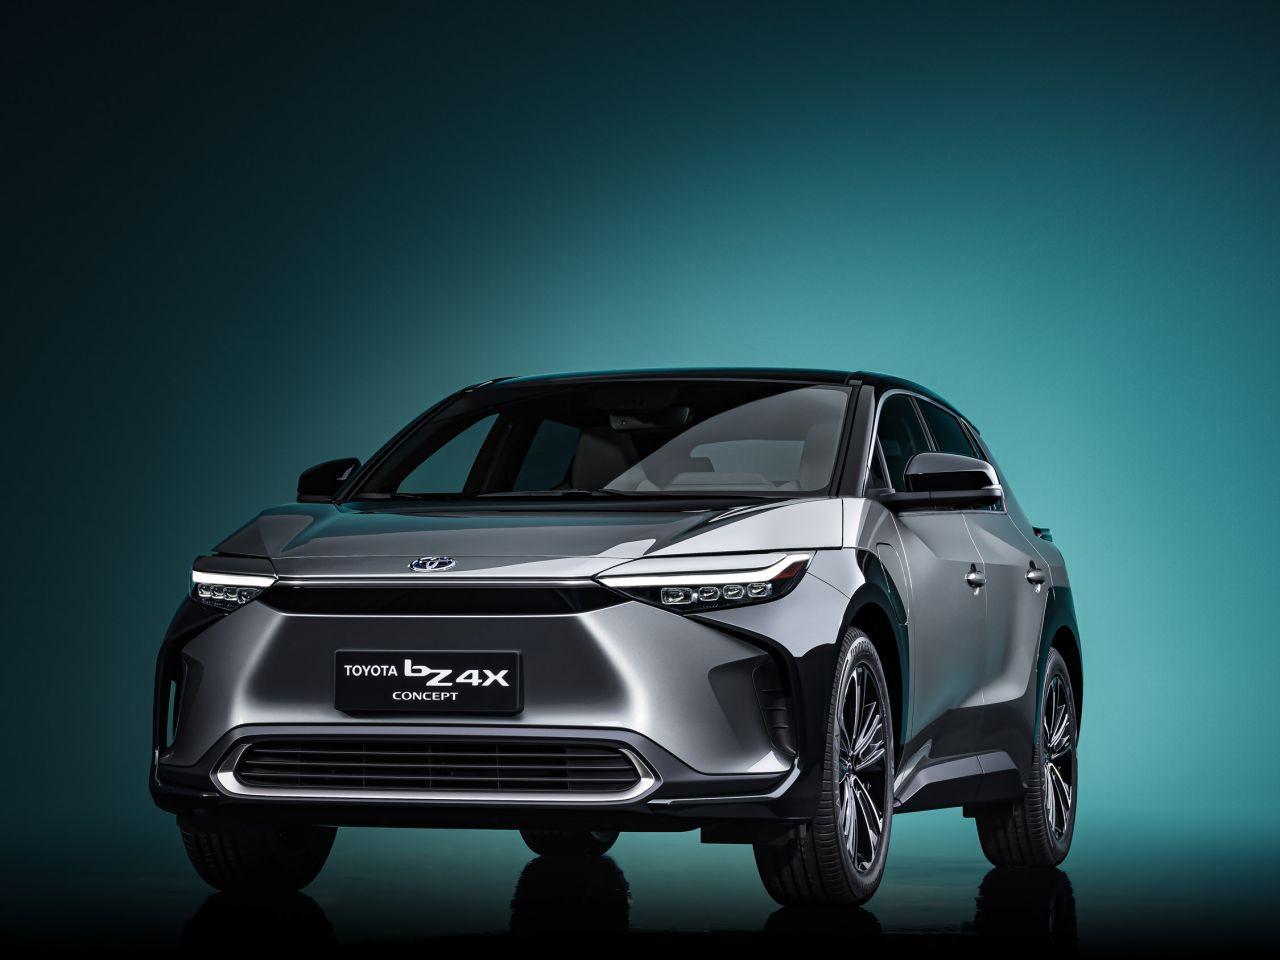 Toyota bZ4X ile yüzde 100 elektrikli otomobil pazarına giriyor - Page 1